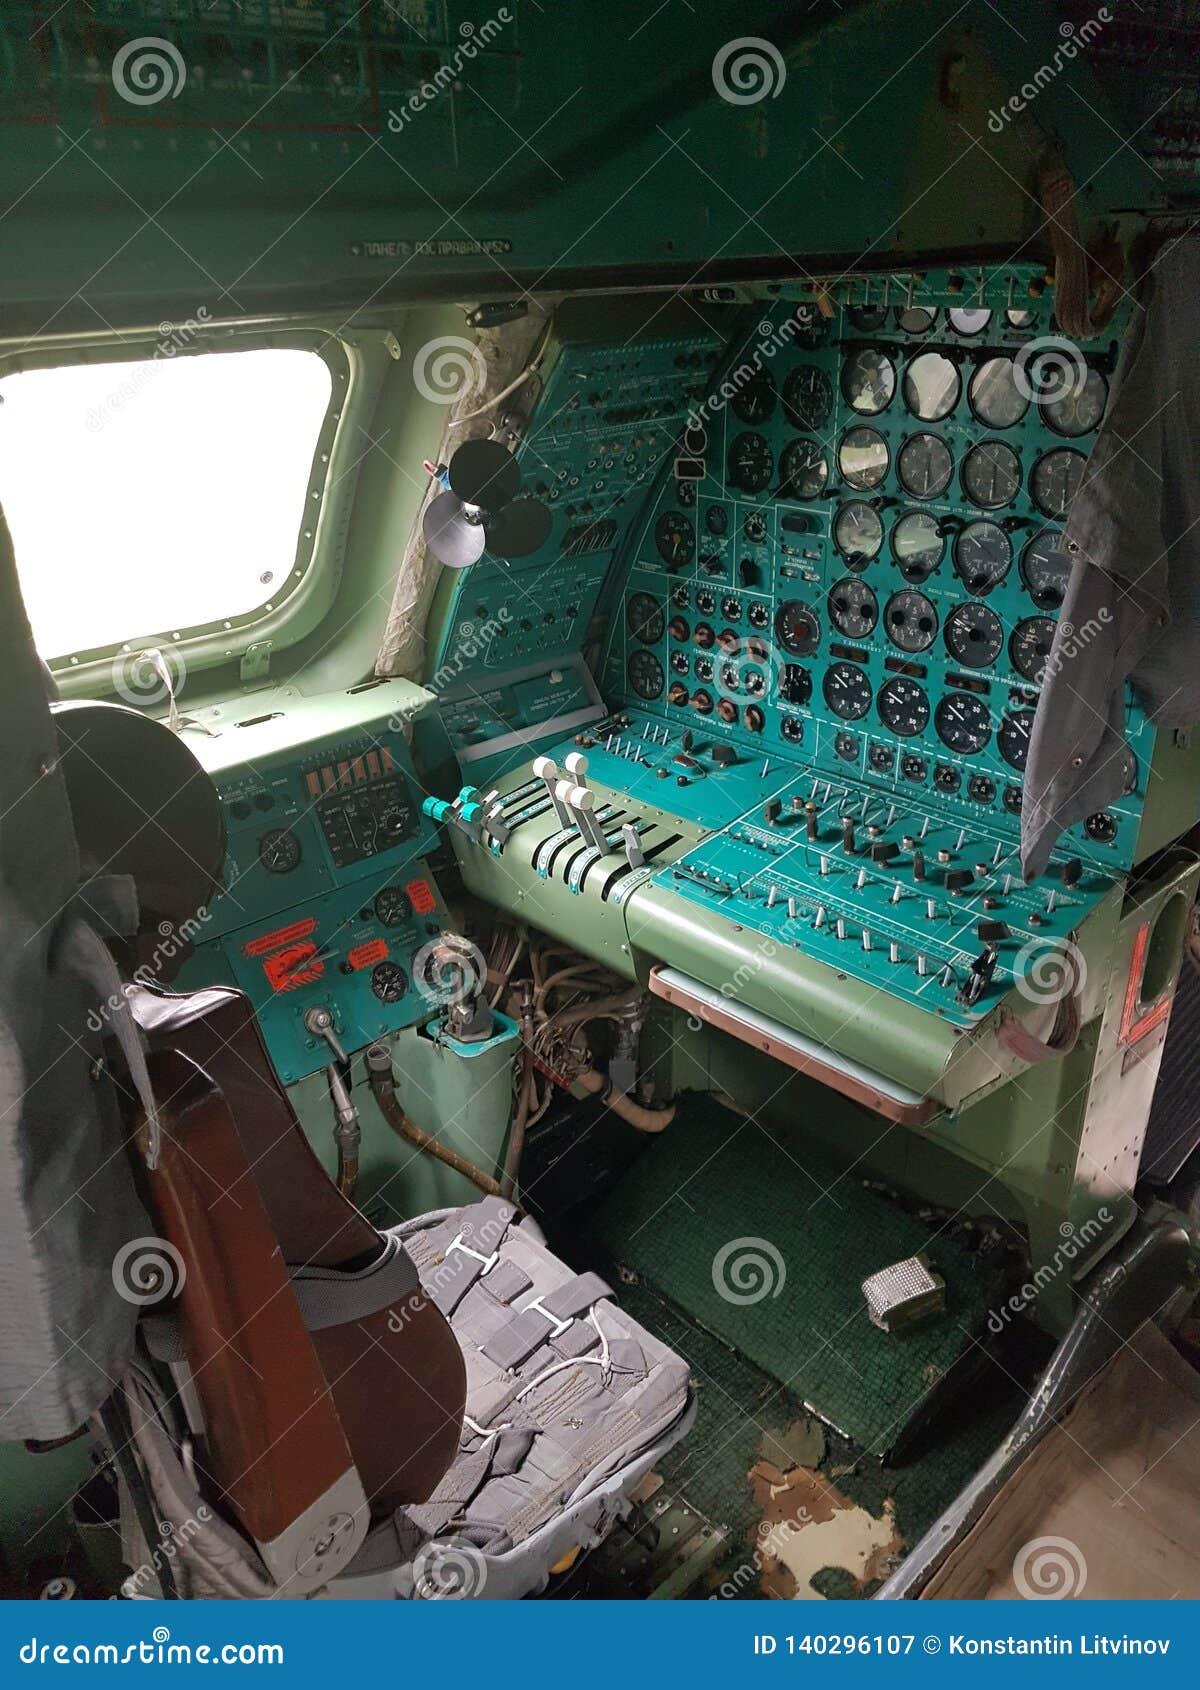 Monino, Ρωσία - 08 08 2018: Αεροσκάφη αγώνα πιλοτηρίων του bombardirovshik